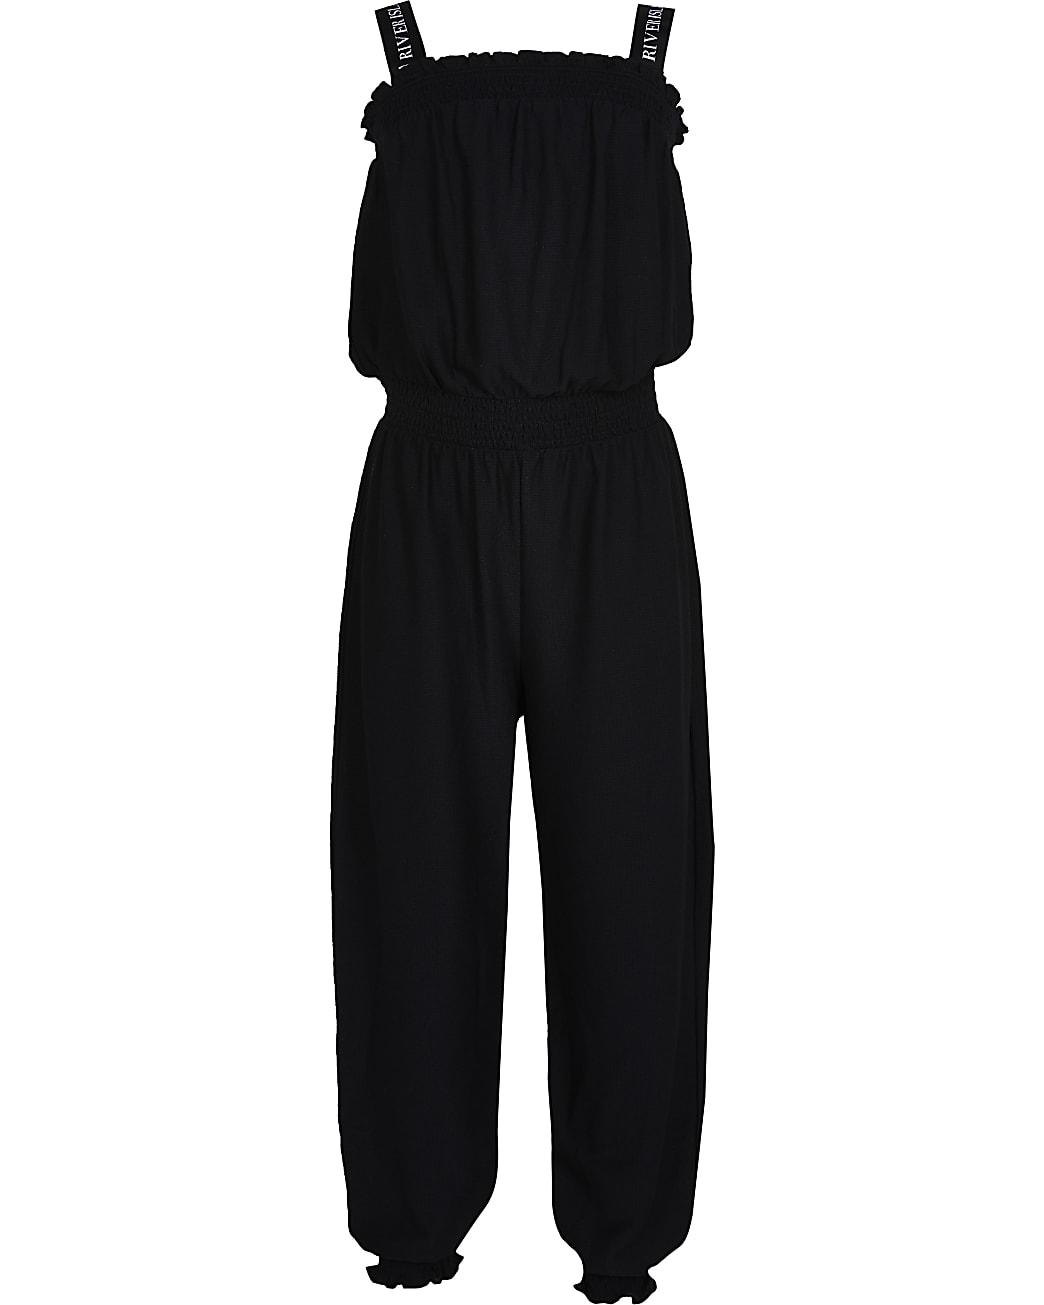 Girls black jumpsuit